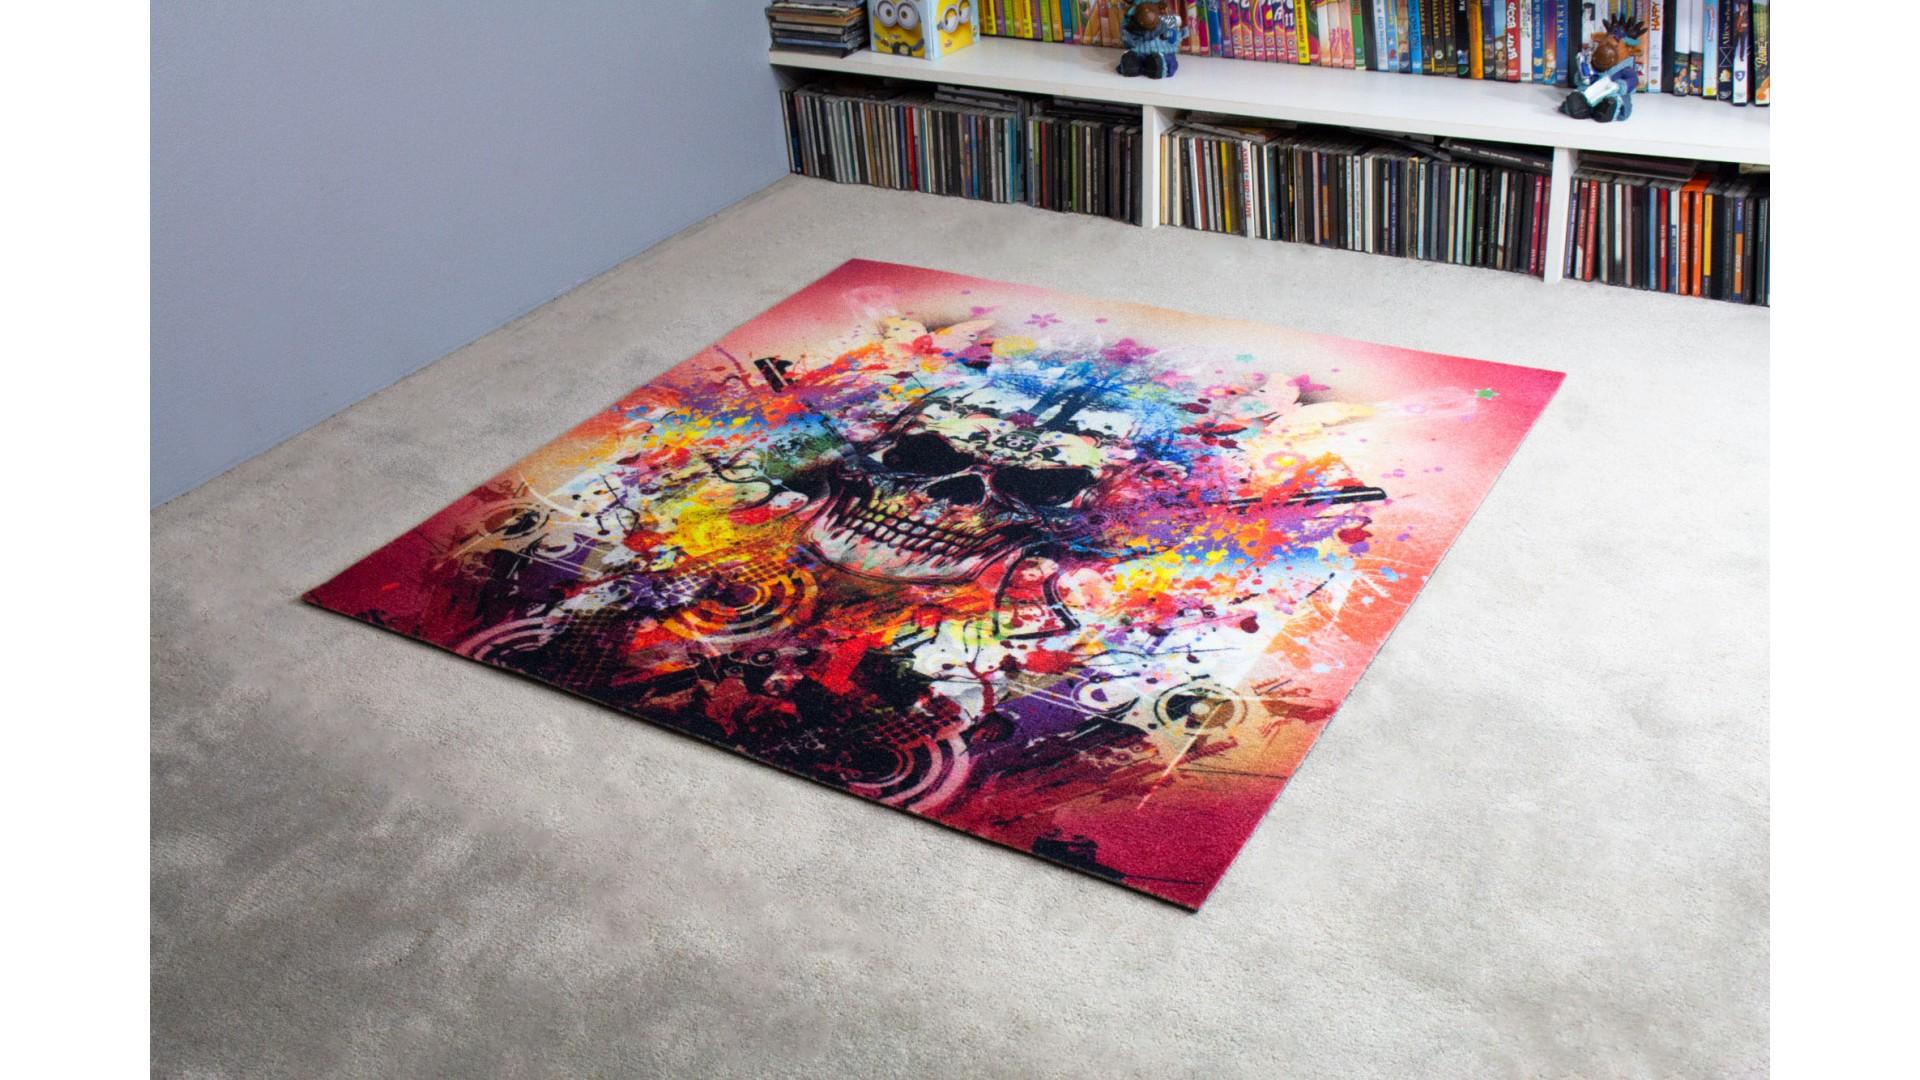 Tapis salon TETE DE MORT STREET ART IMPRIME multicolore DEBONSOL